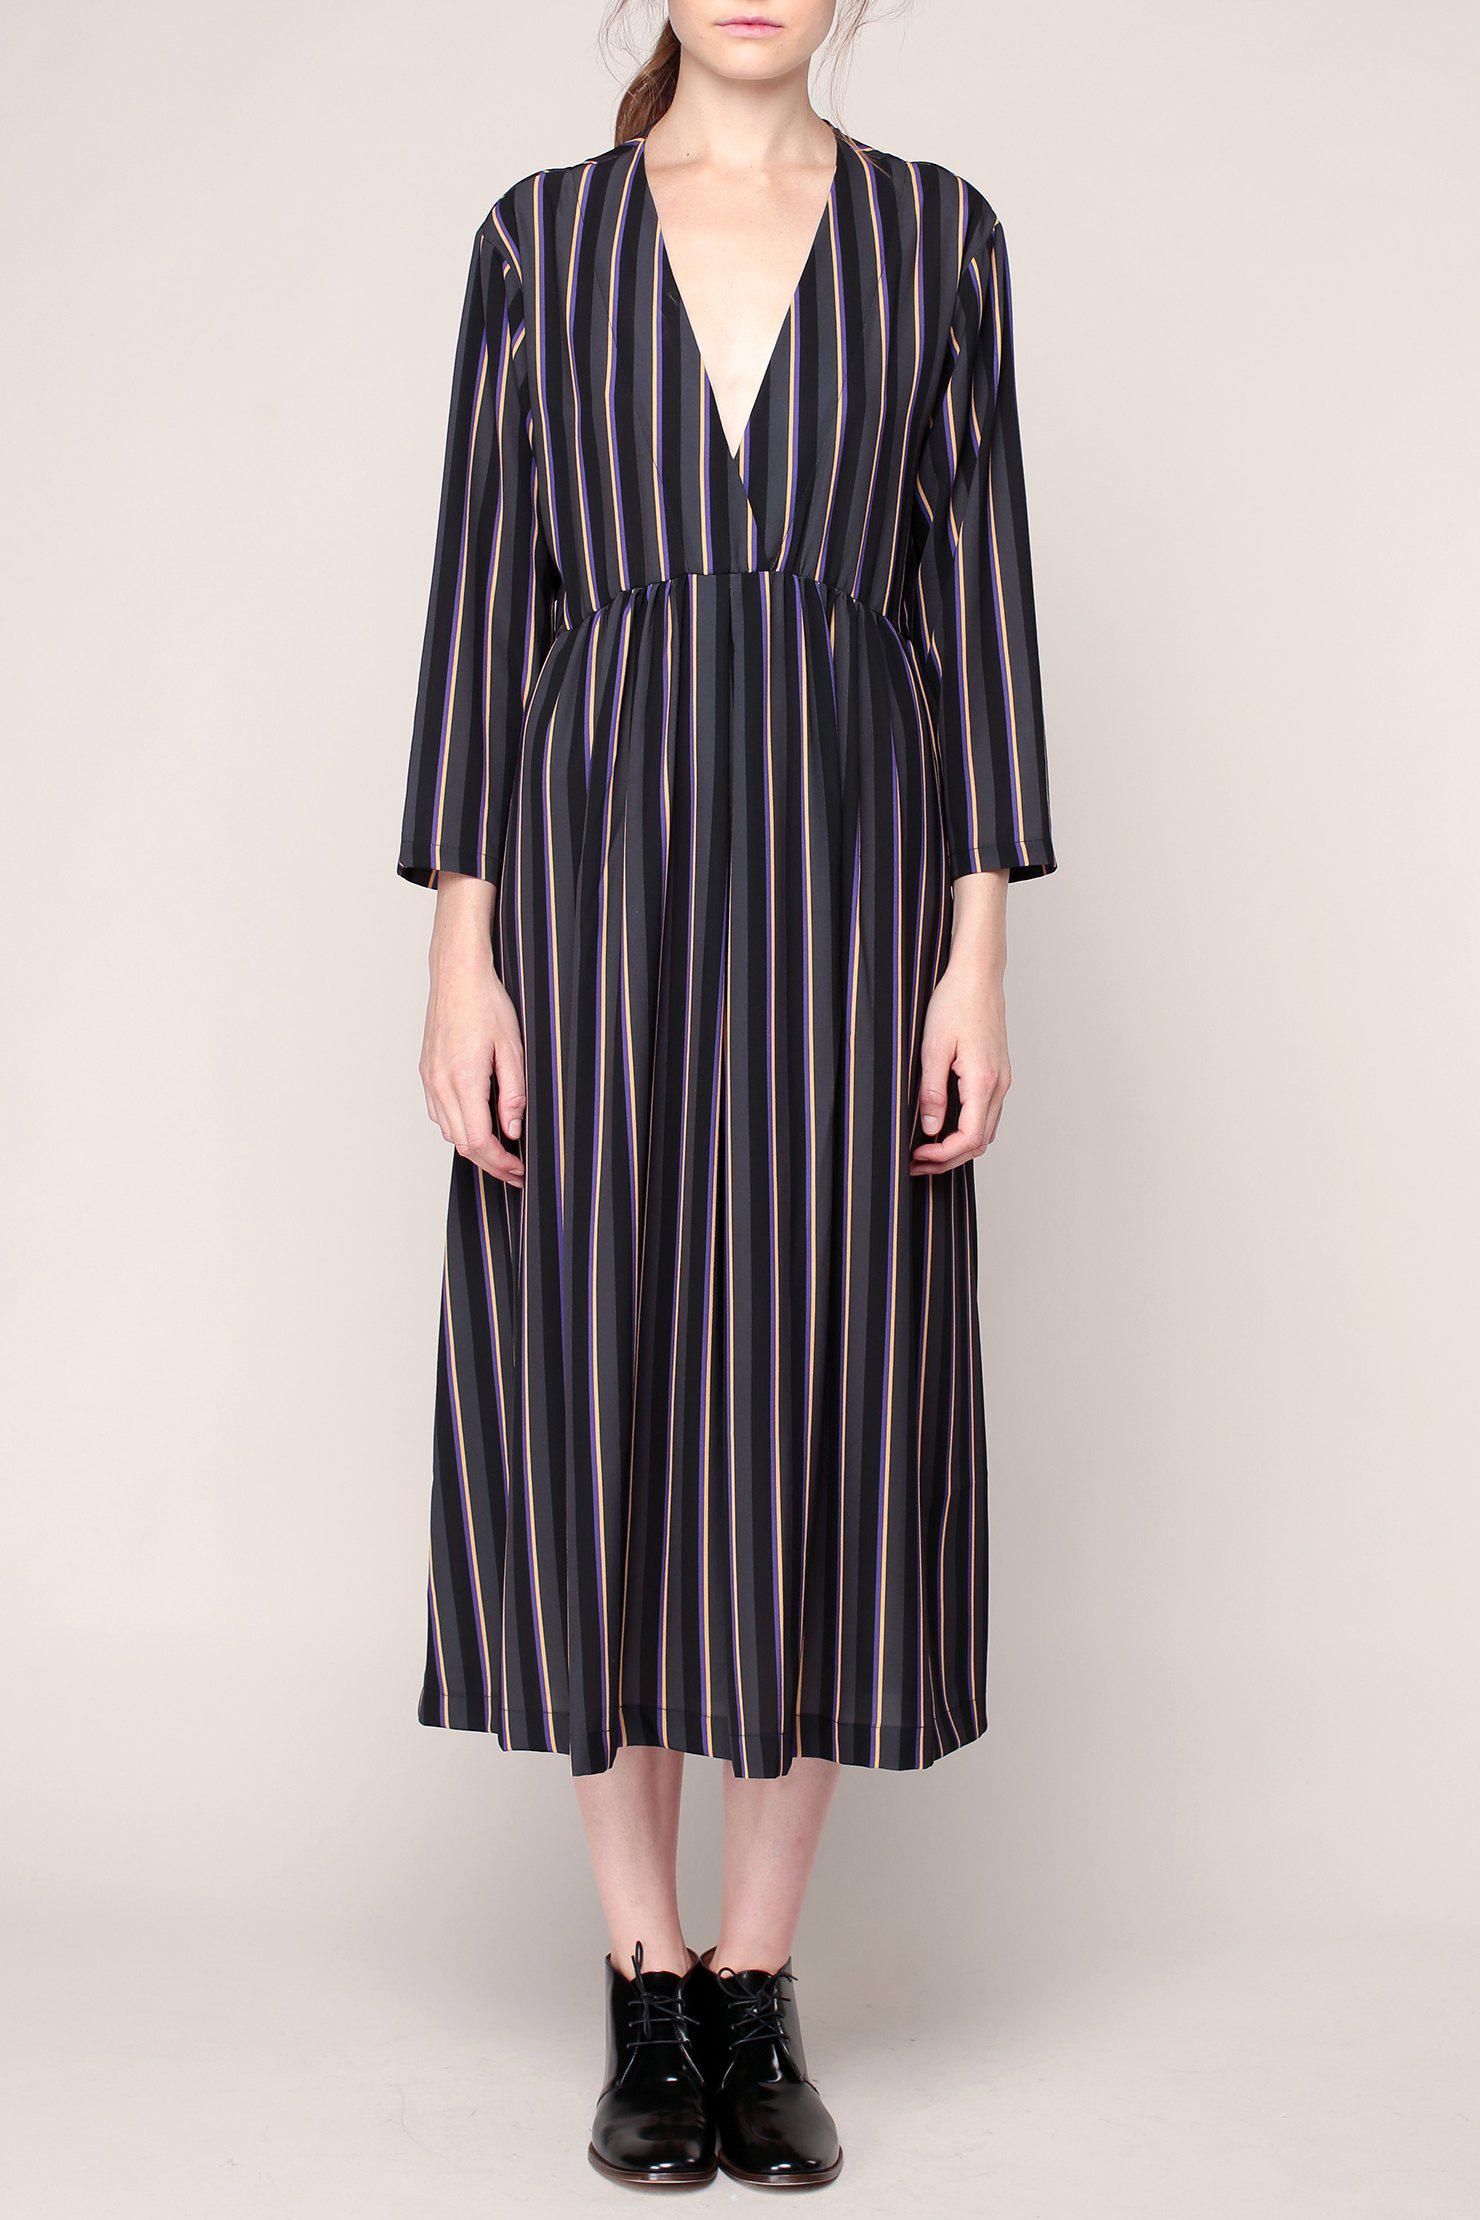 DRESSES - 3/4 length dresses MAISON OLGA PKvS1XeiO